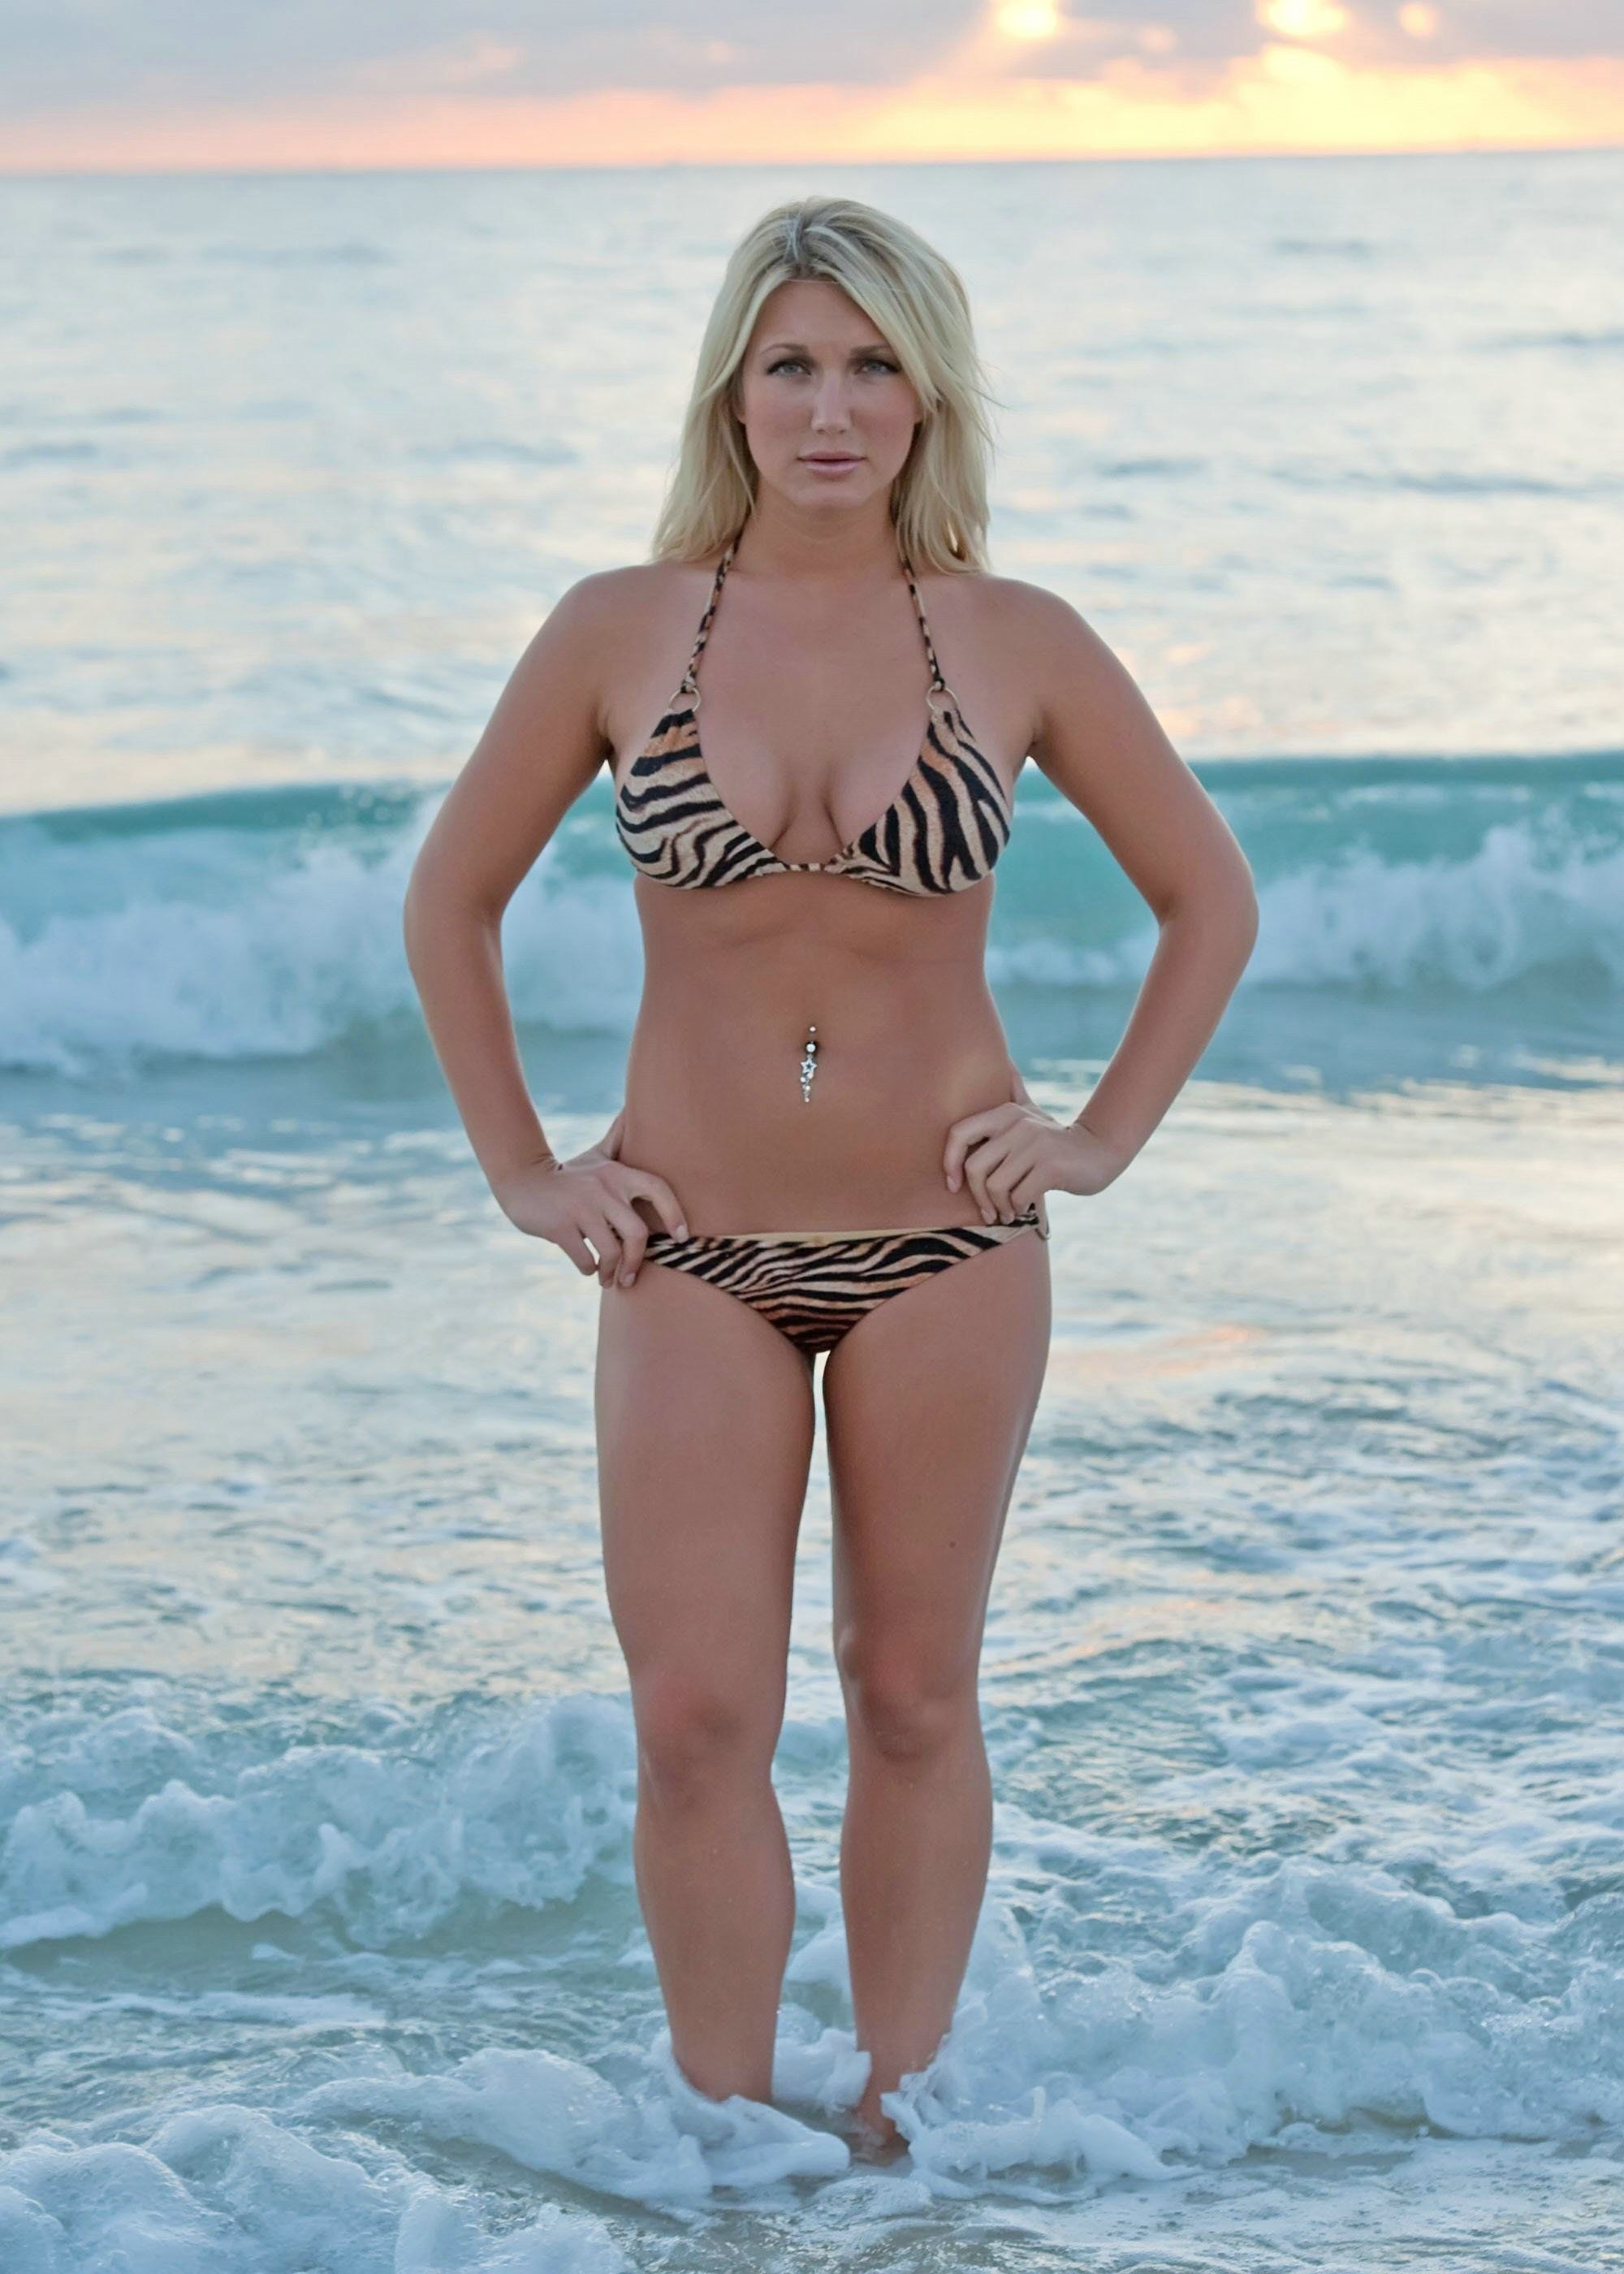 Bikini Nick Hogan naked (26 photo), Sexy, Sideboobs, Twitter, panties 2015